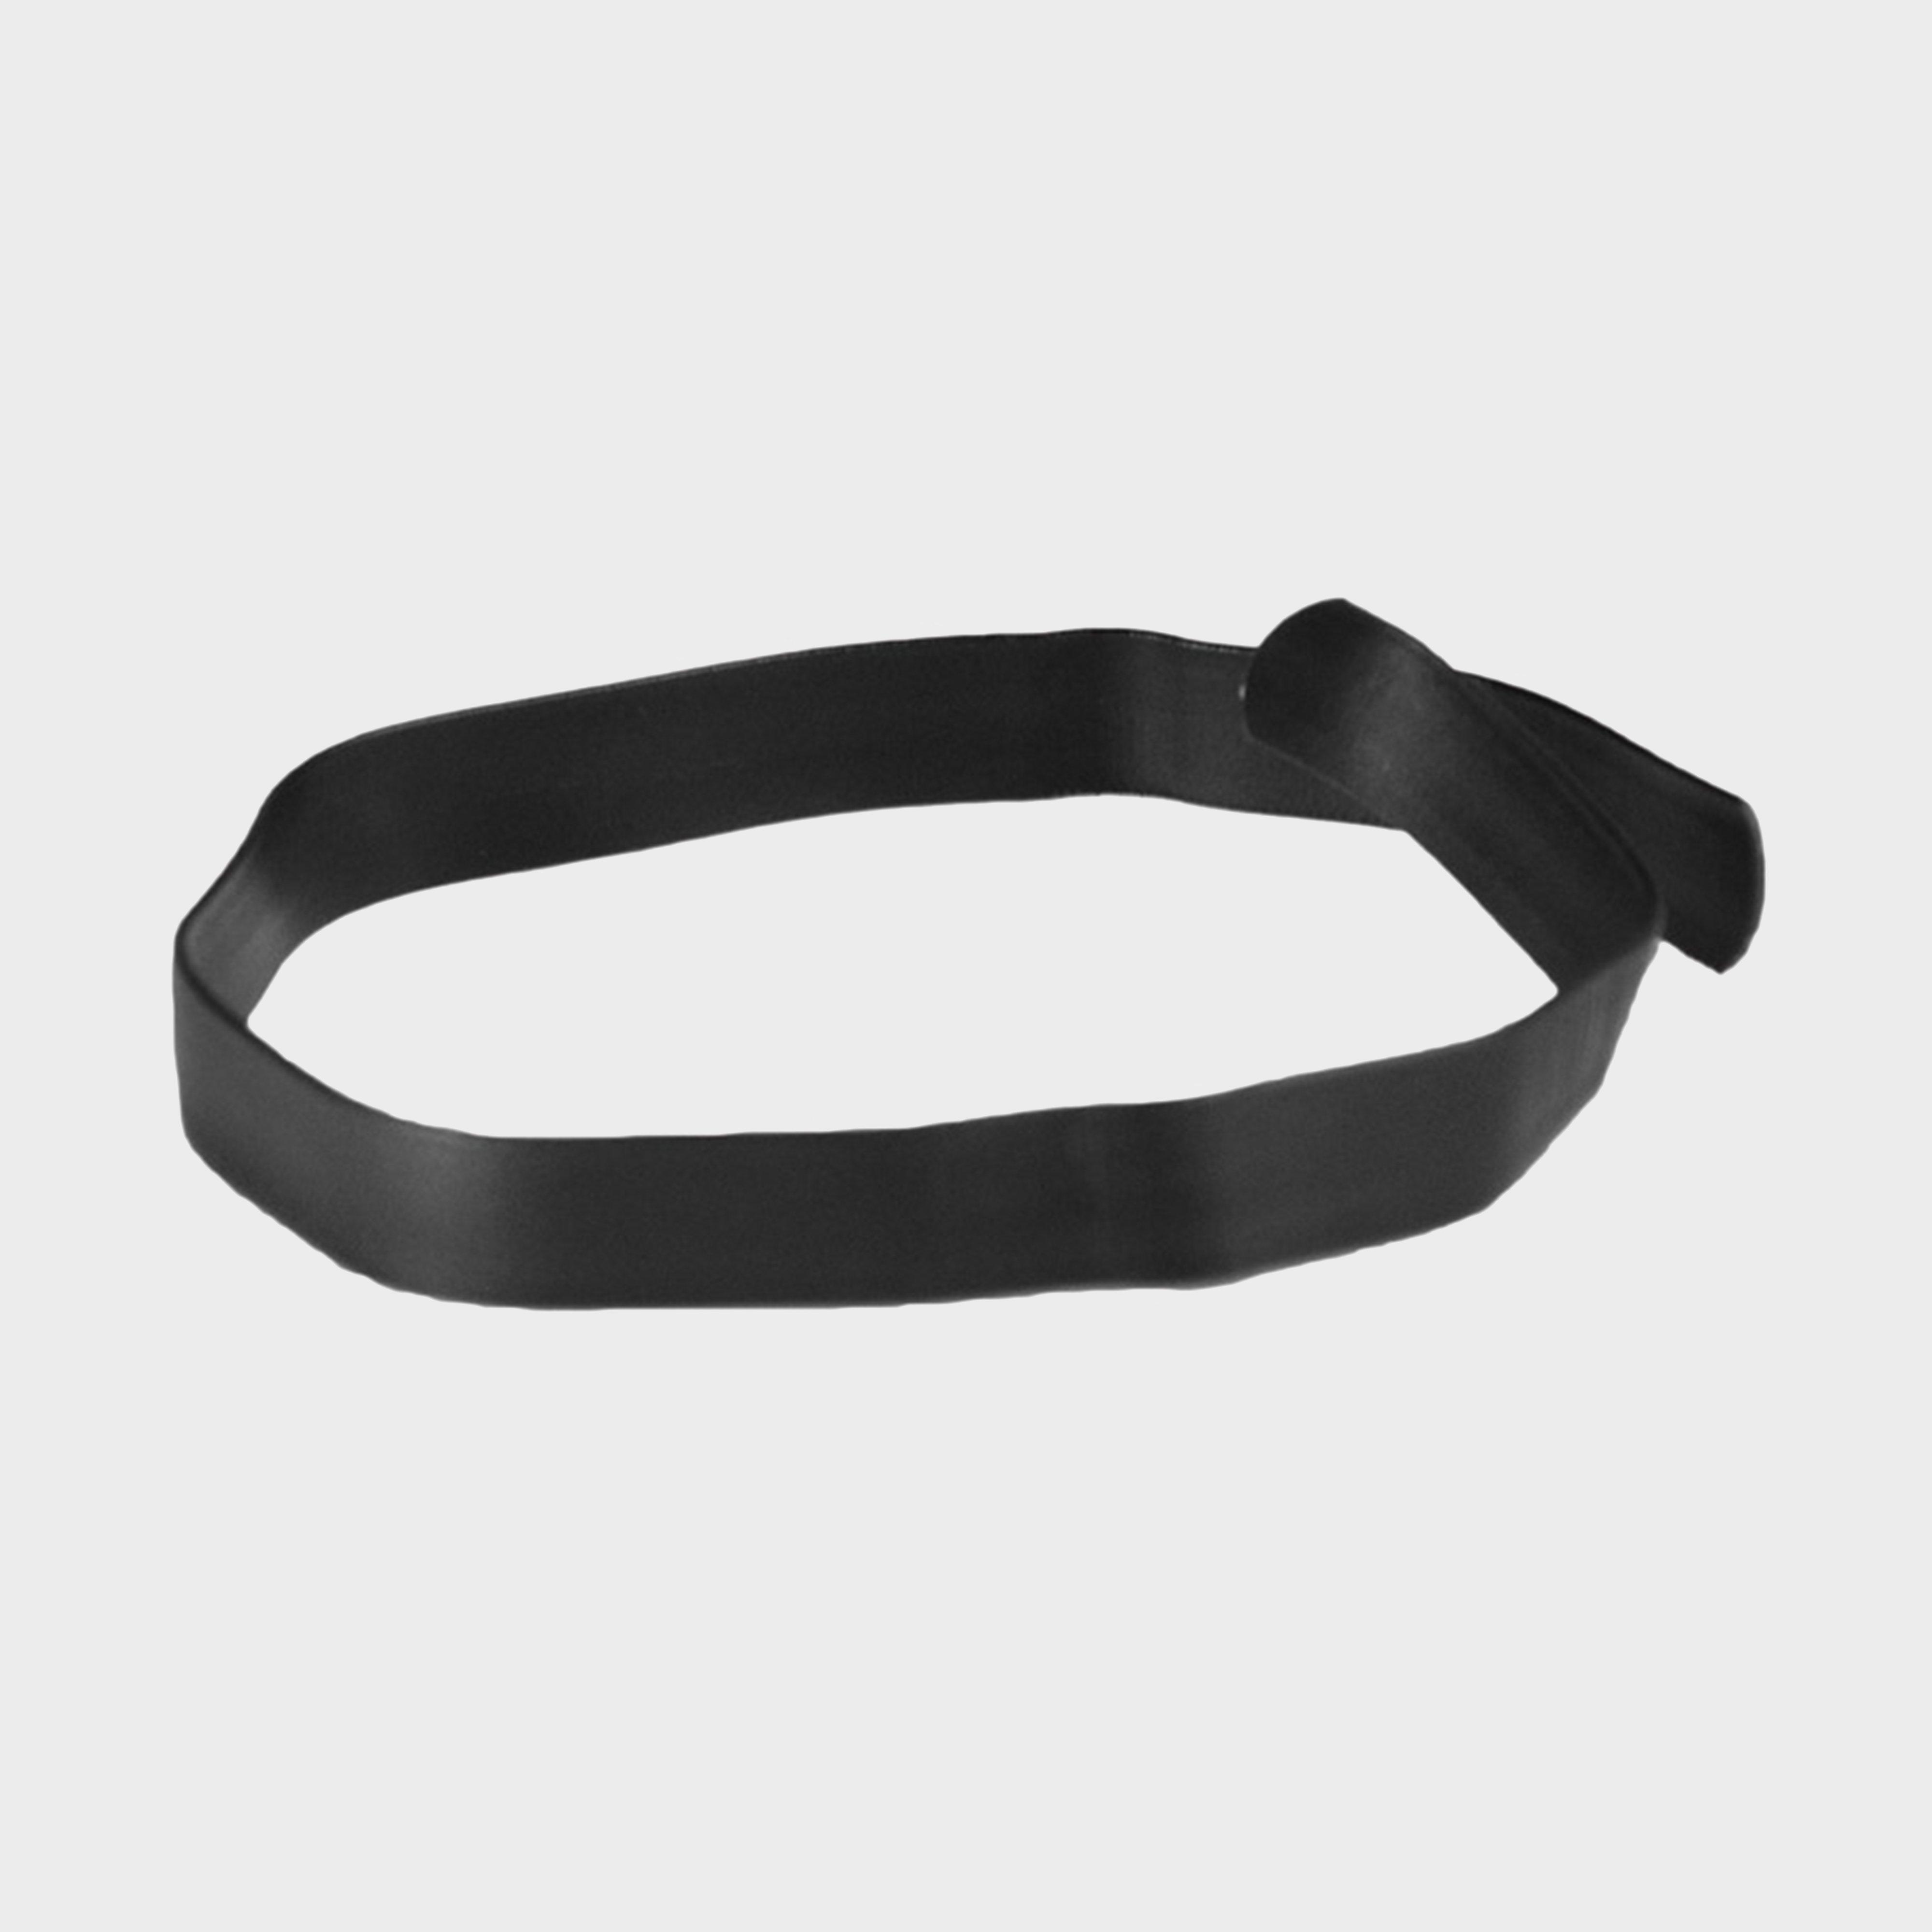 Trekmates Gaiter Strap - Black/10mm  Black/10mm